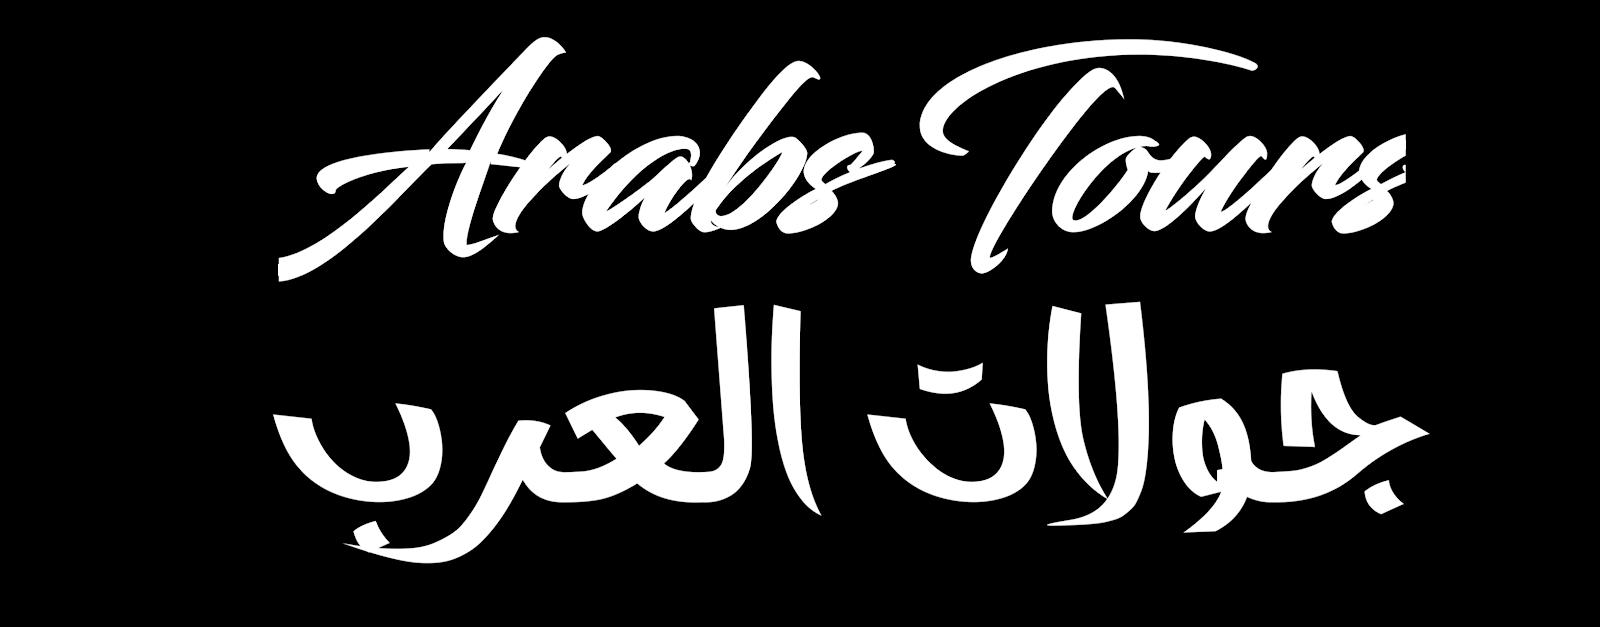 جولات العرب - Arabs Tours